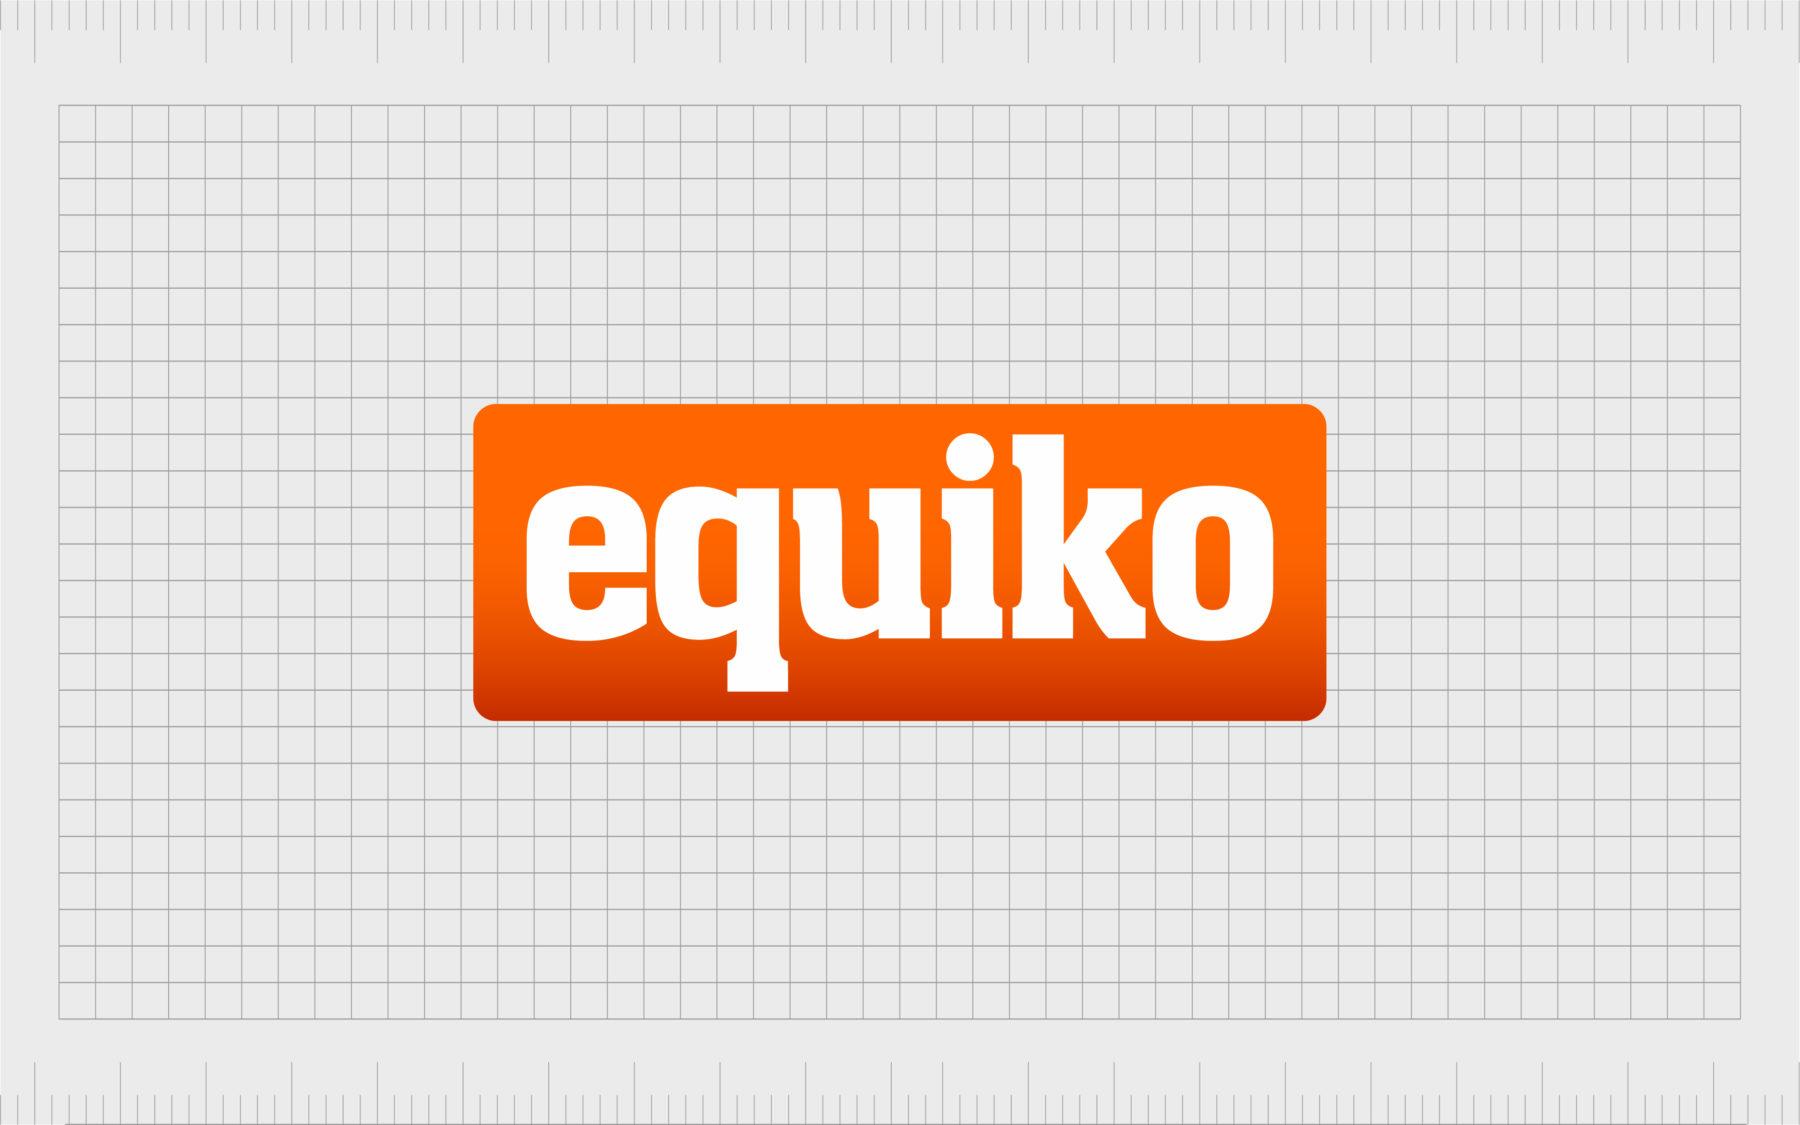 Equiko